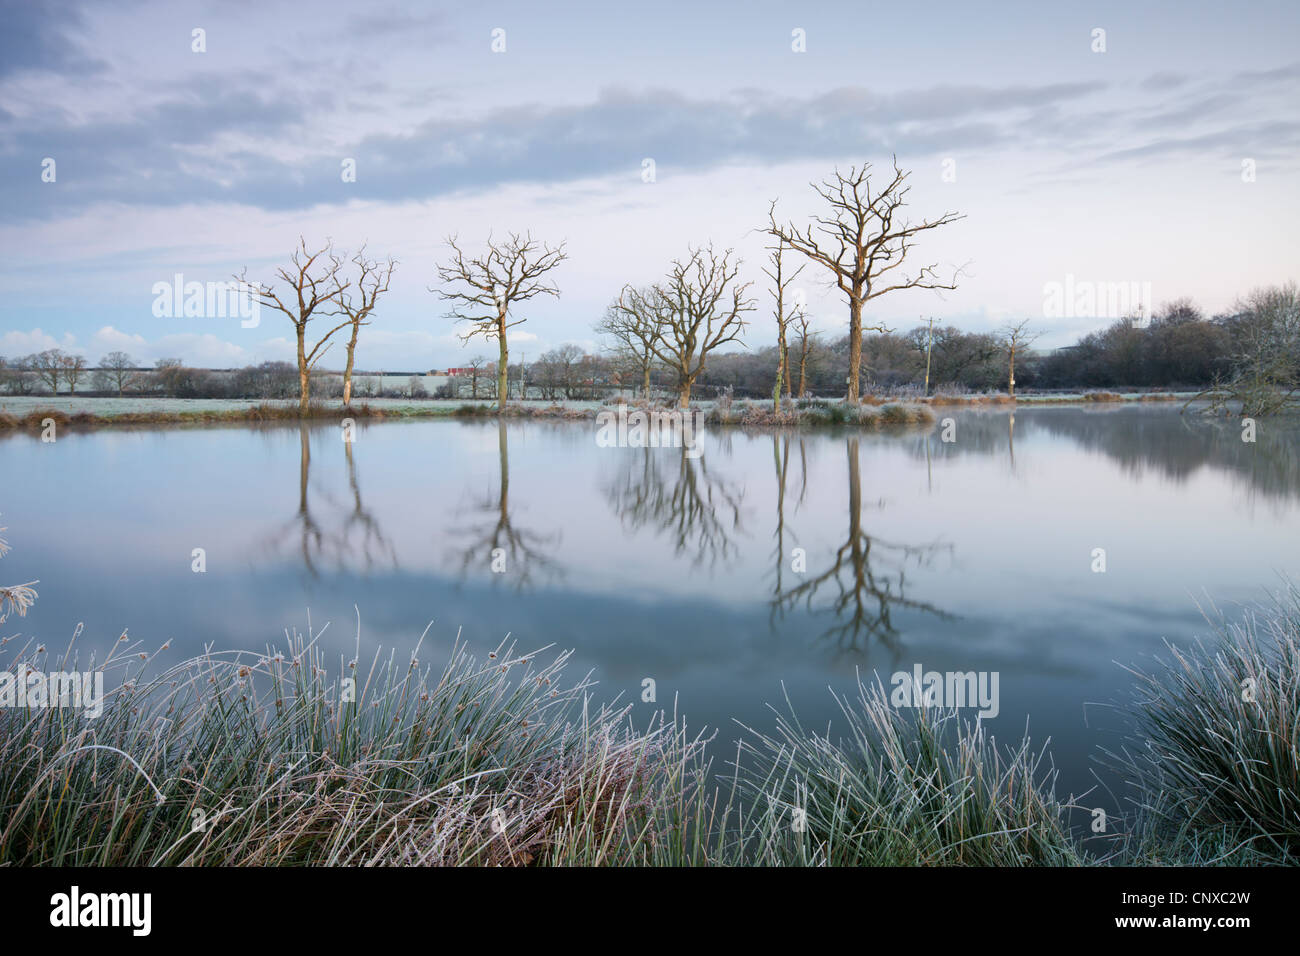 Frosty winter scenes beside a still lake, Morchard Road, Devon, England. Winter (November) 2010. - Stock Image